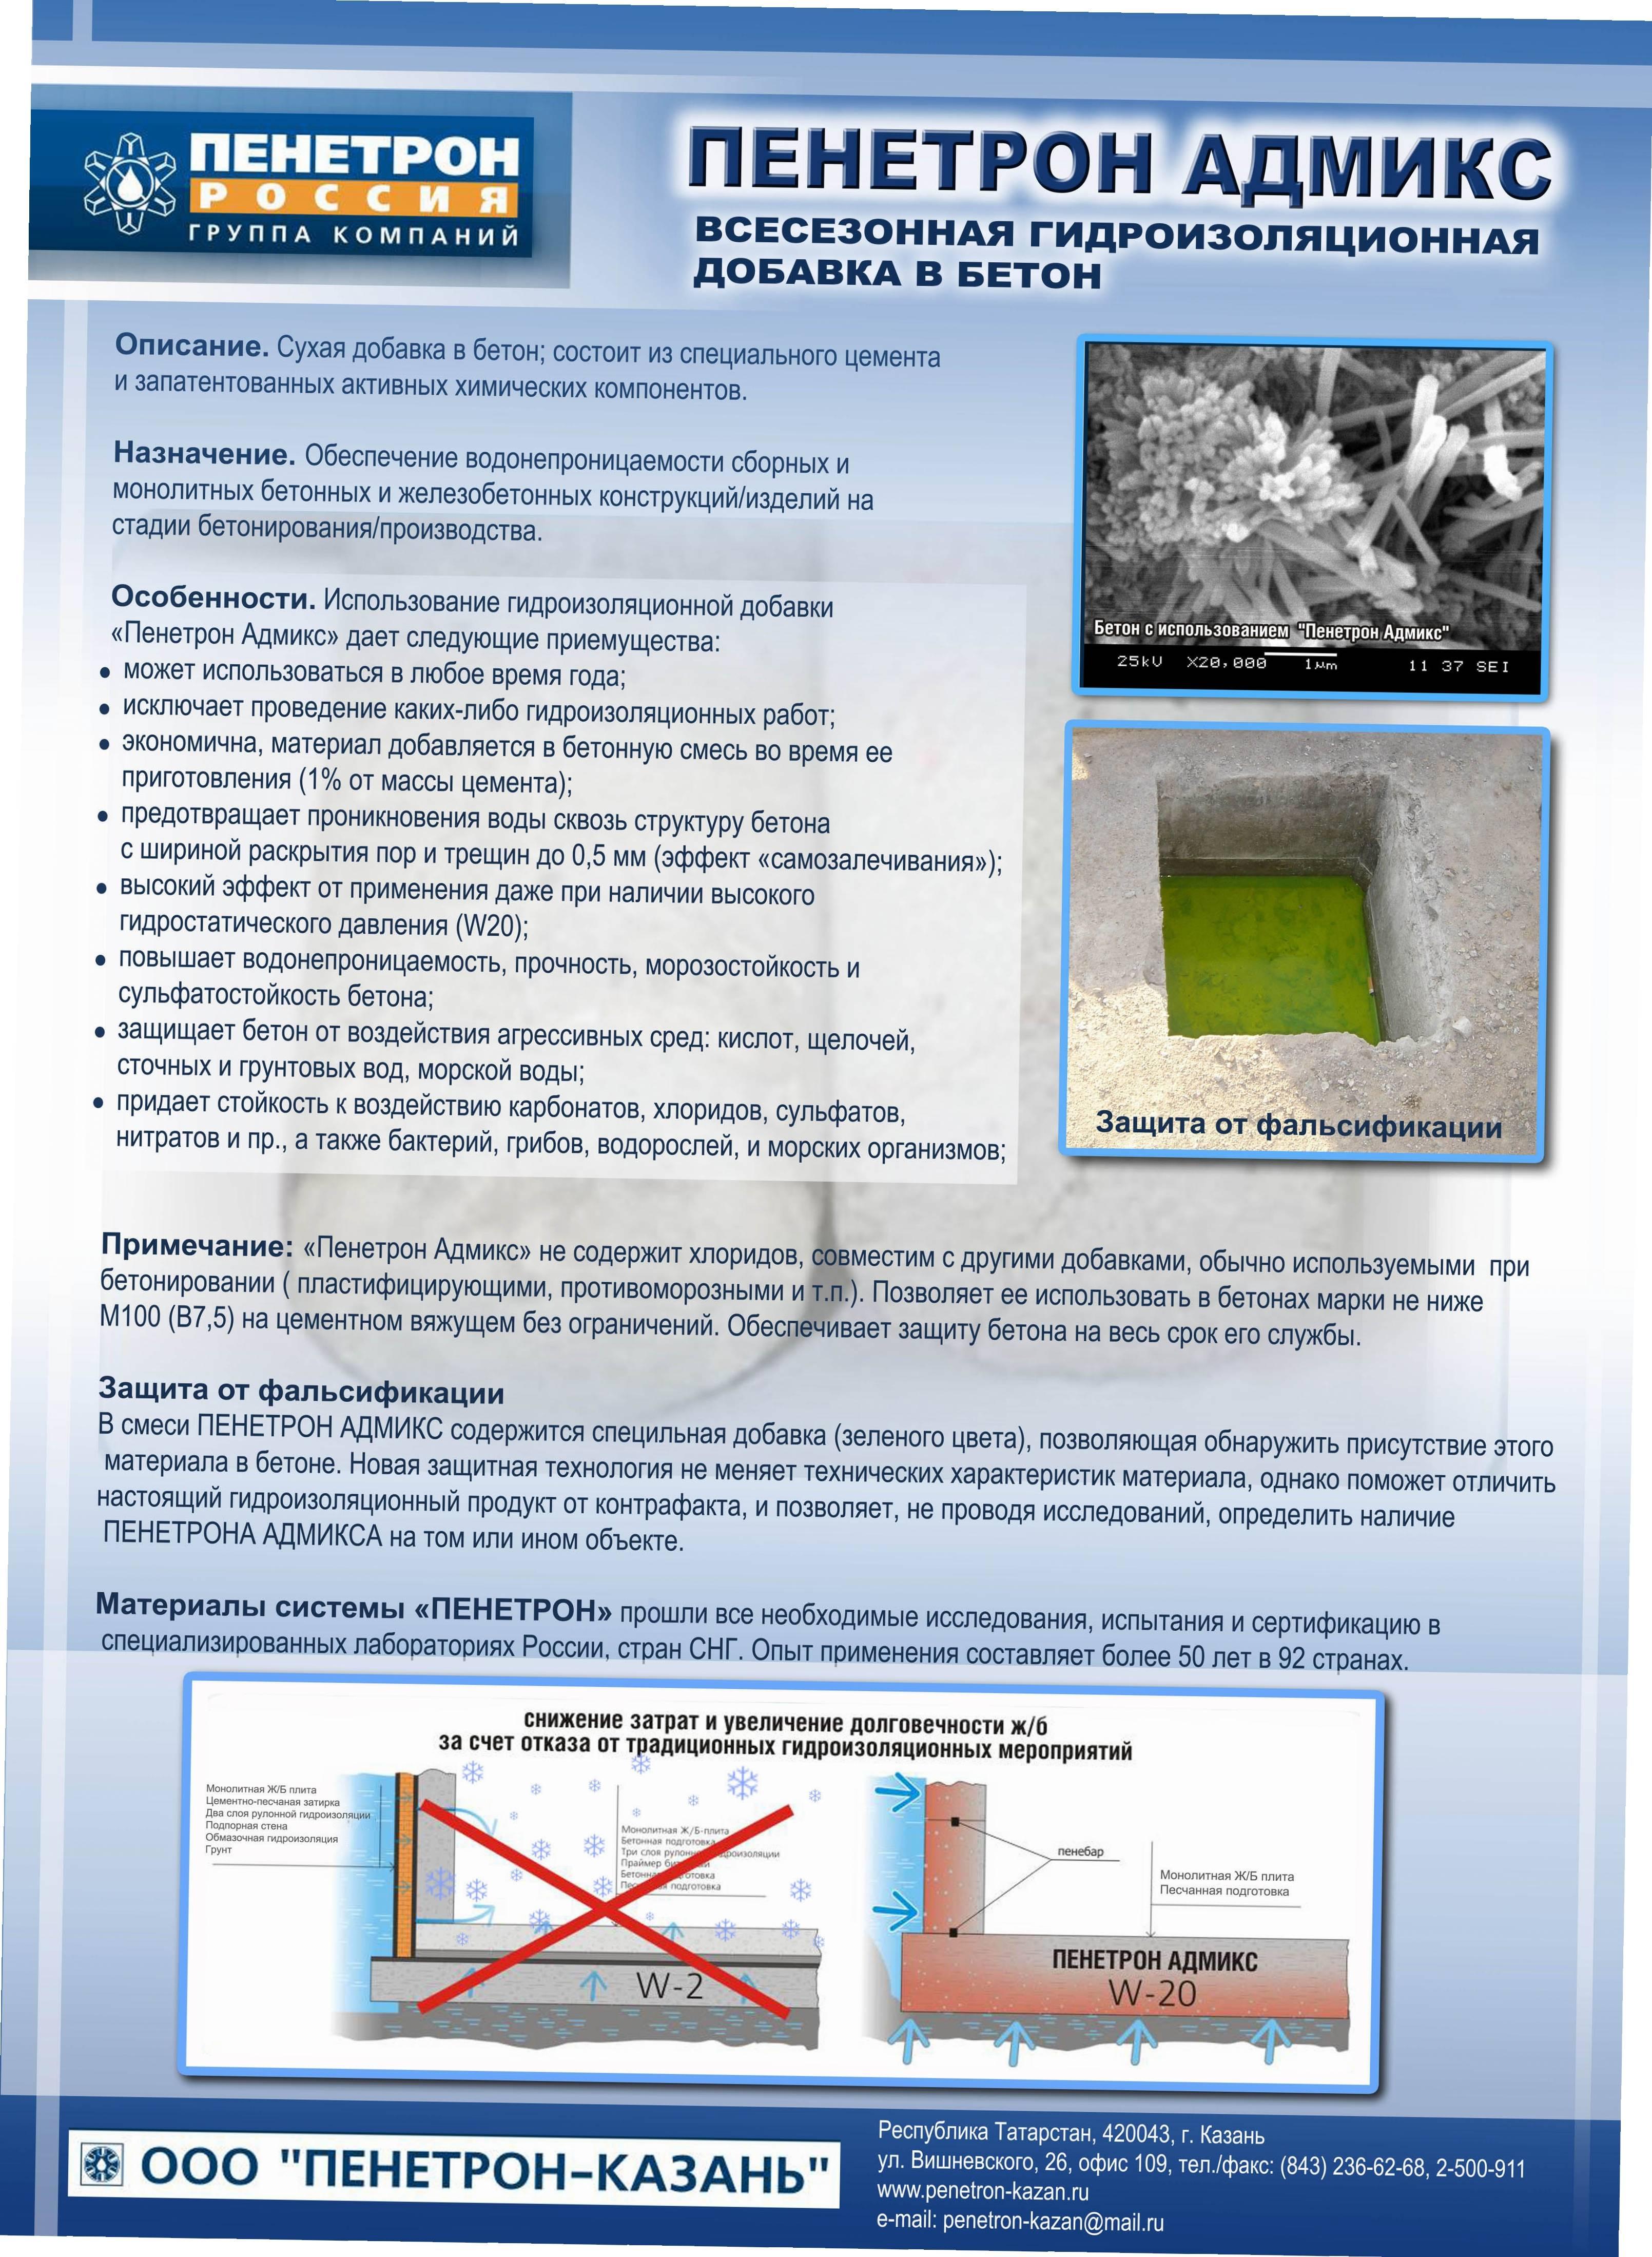 Гидроизоляция бетона - пенетрон-россия